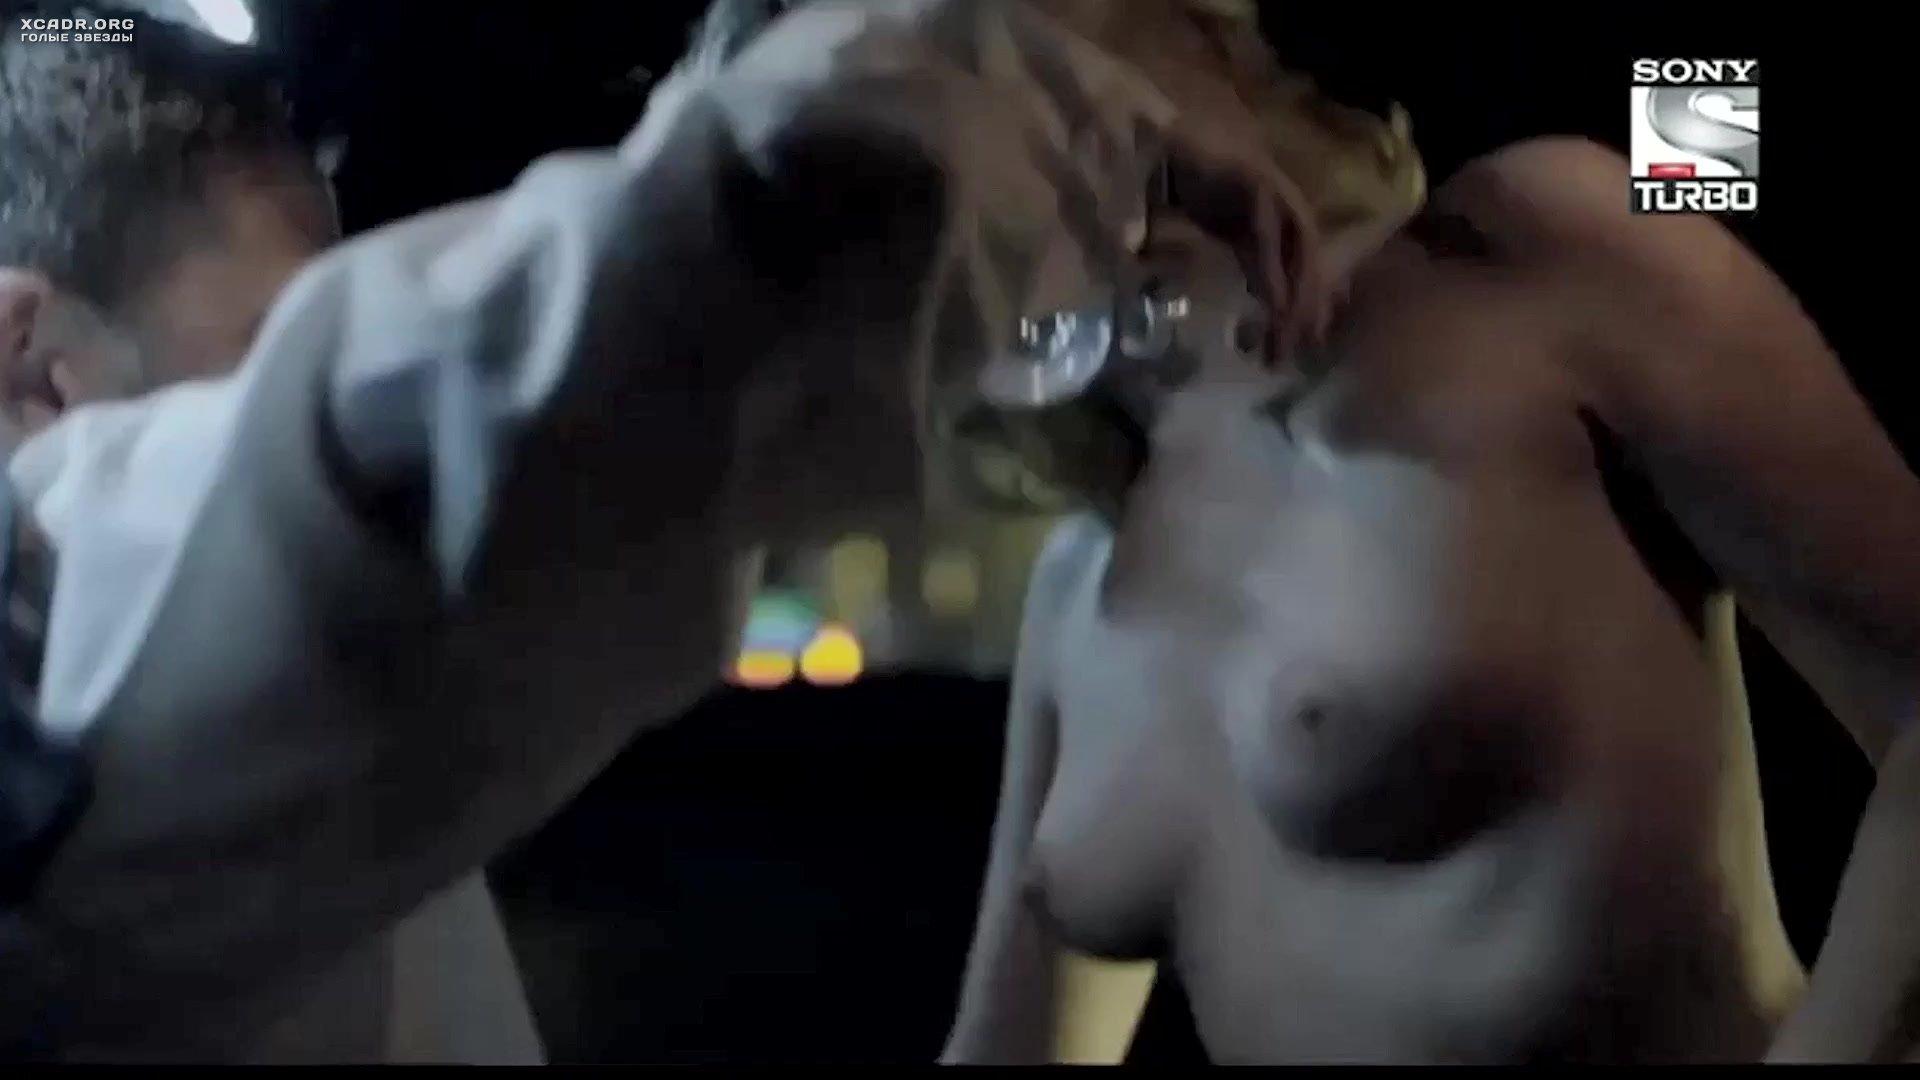 Nikki Griffin Breasts Scene In The Dukes Of Hazzard